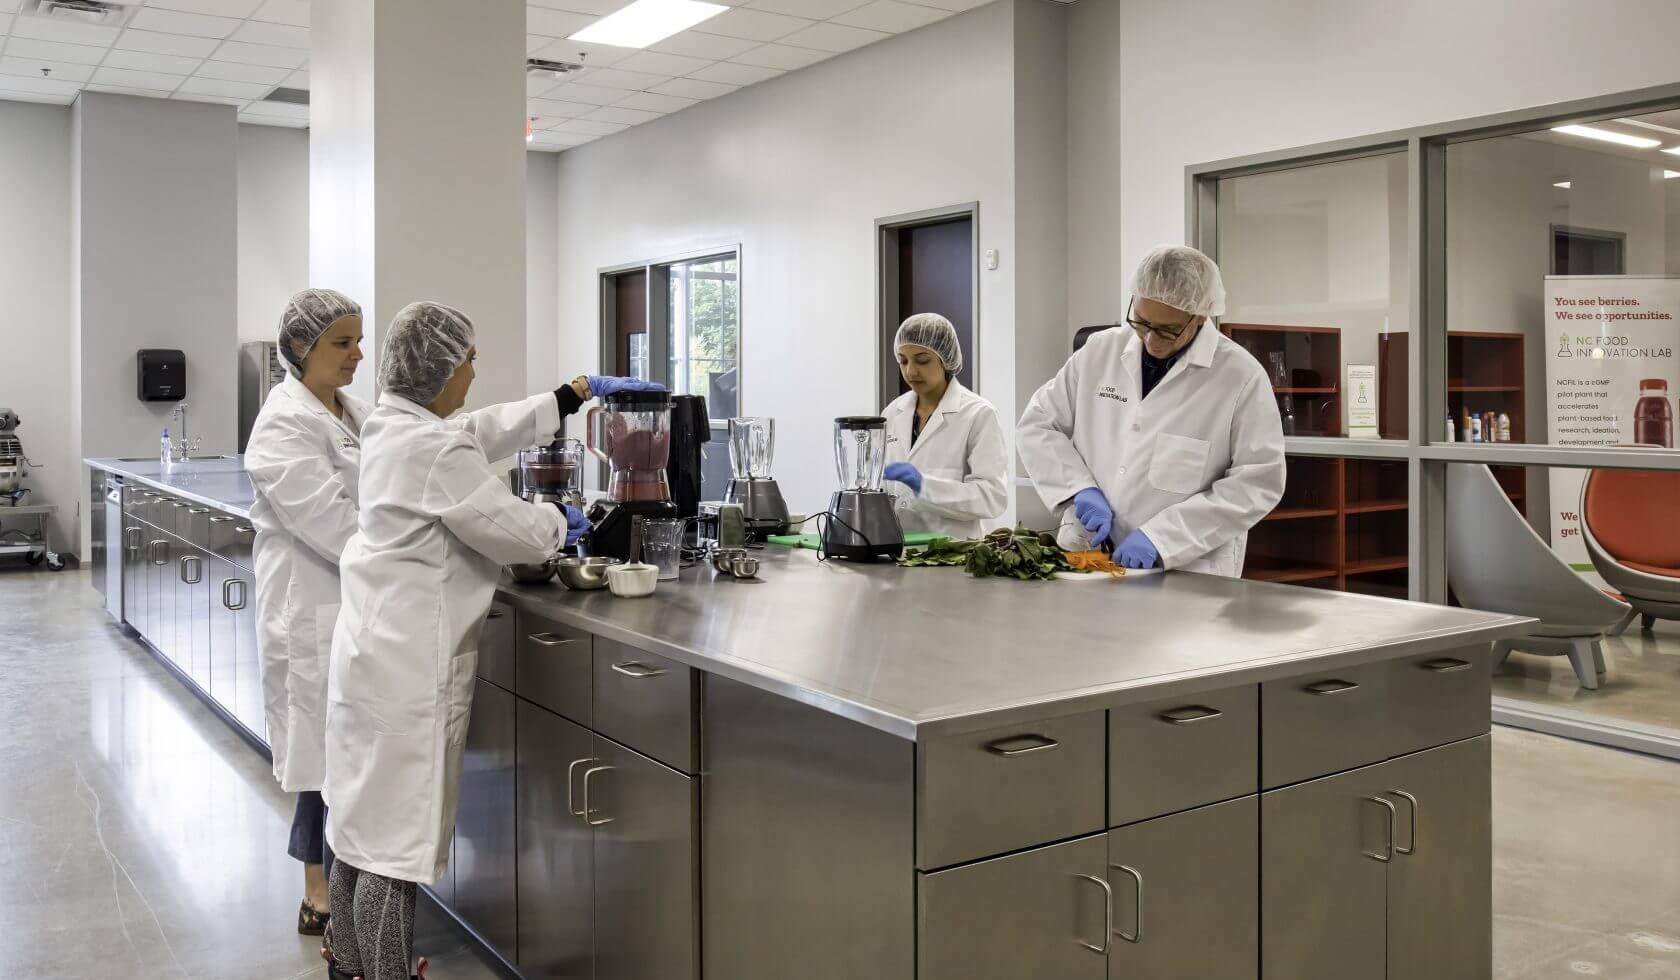 NCFIL plant-based food manufacturing innovation lab